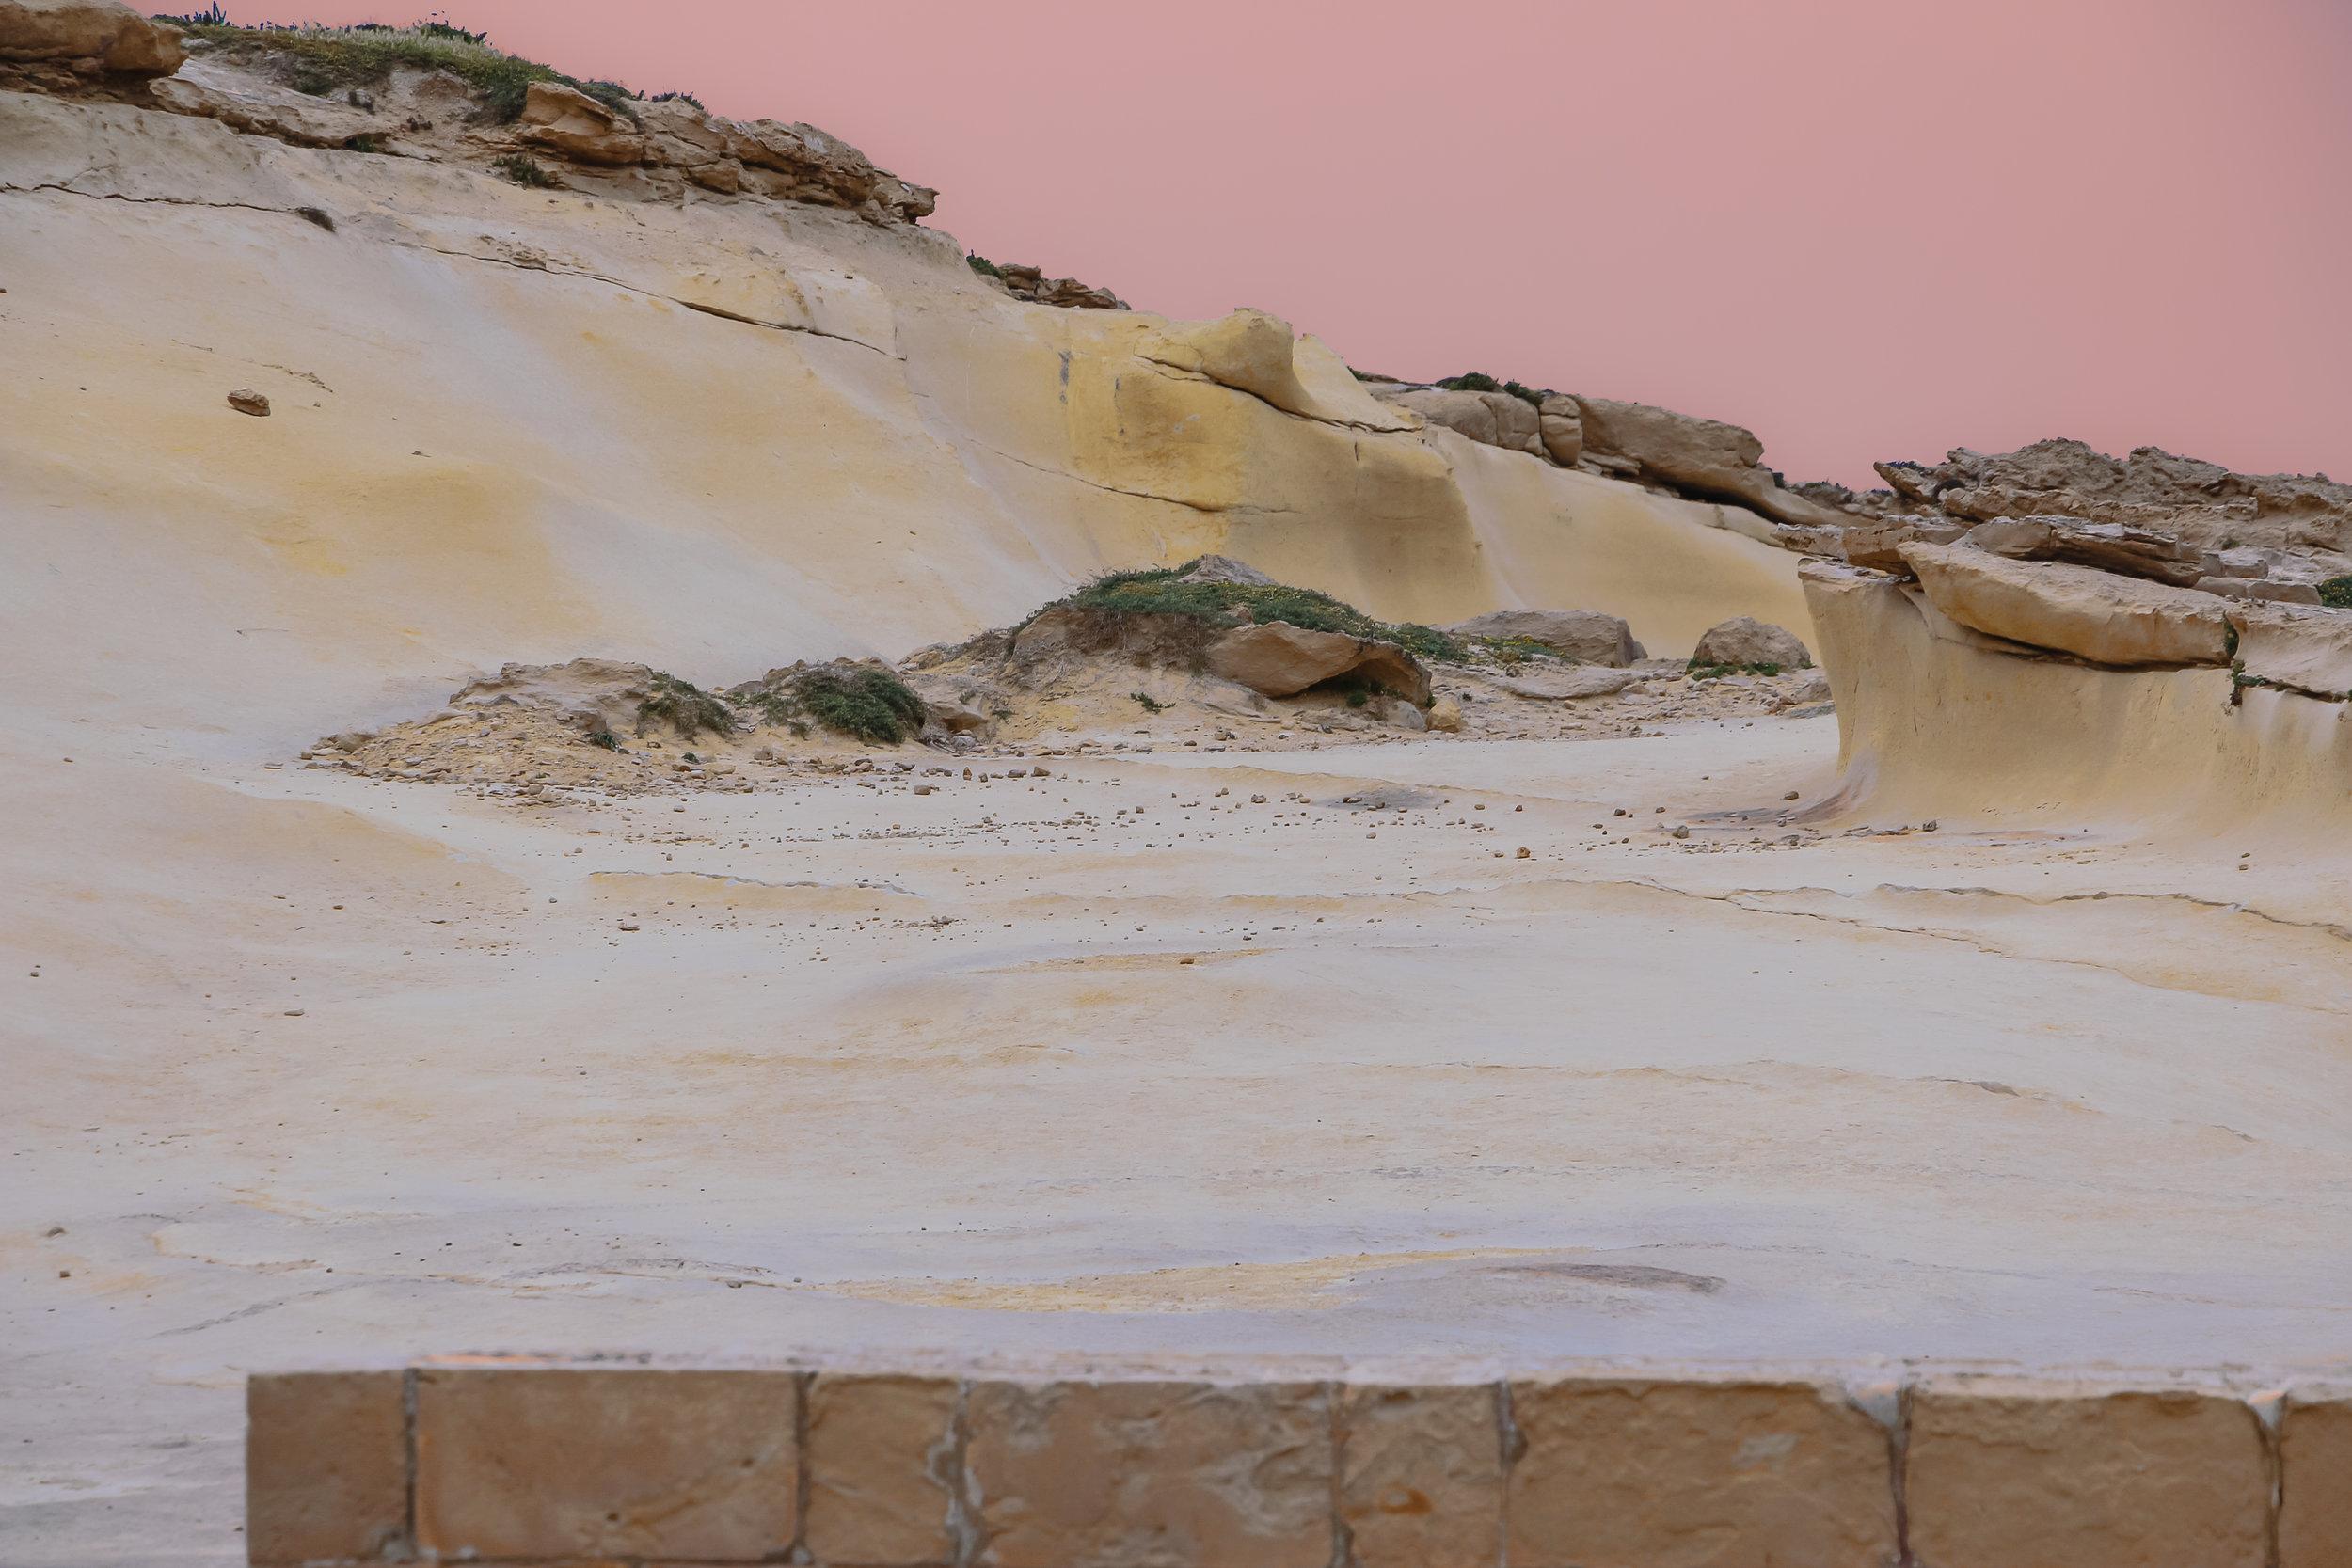 Mediterranean Coast | MAltese Islands Nature | LAndscape - Thinking About Appreciation For Quality In Malta | Gozo, Malta, Europe | DoLessGetMoreDone.com | - Canon Minimal Fine Art Travel Documentary Photography - search for Liveability | Sustainability